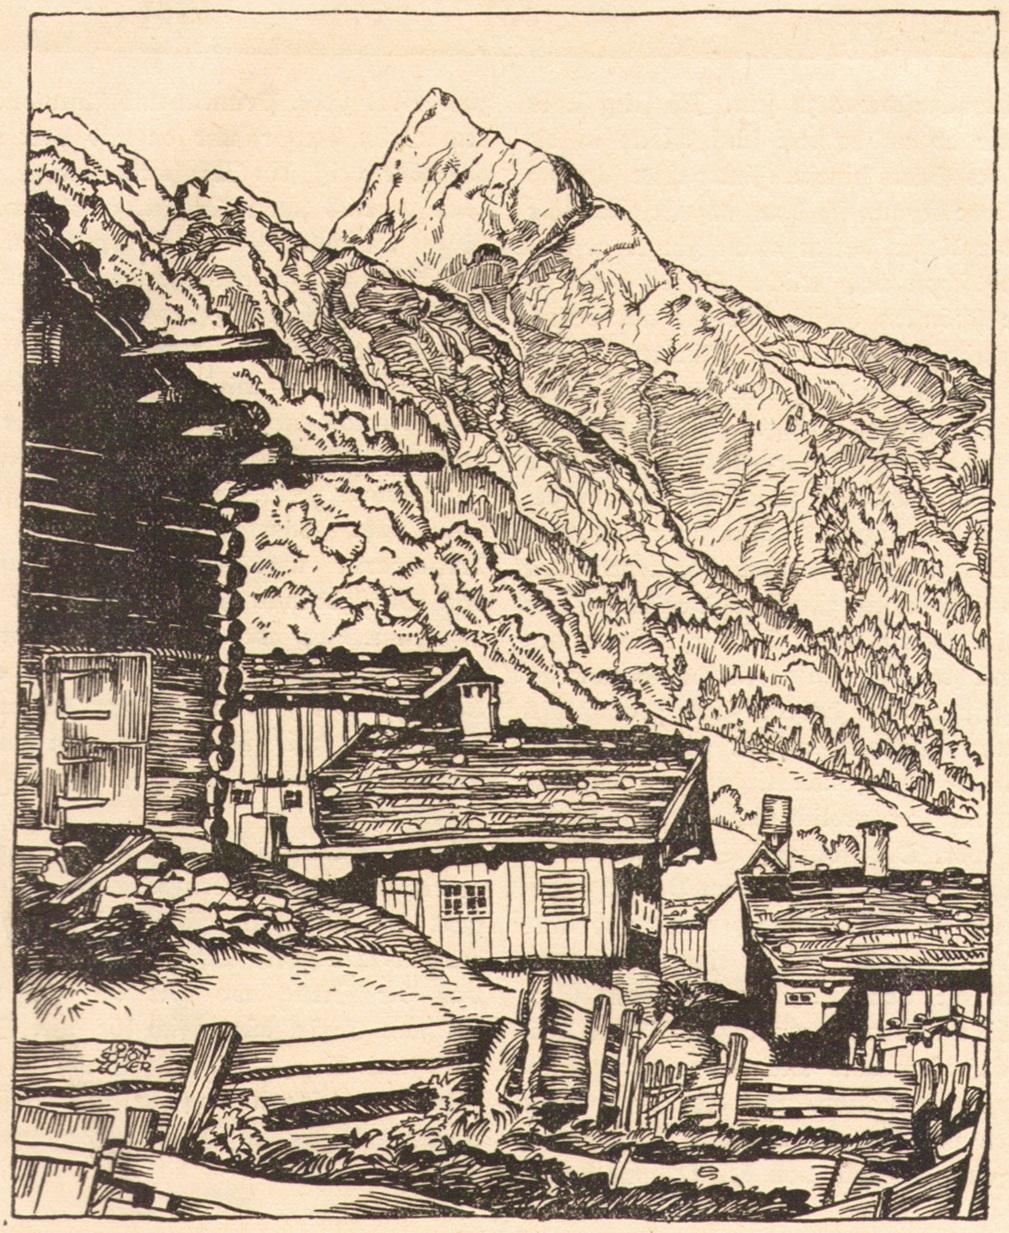 Anton Schoenecker - Gerstruben mit Hoefats 1921p.jpg